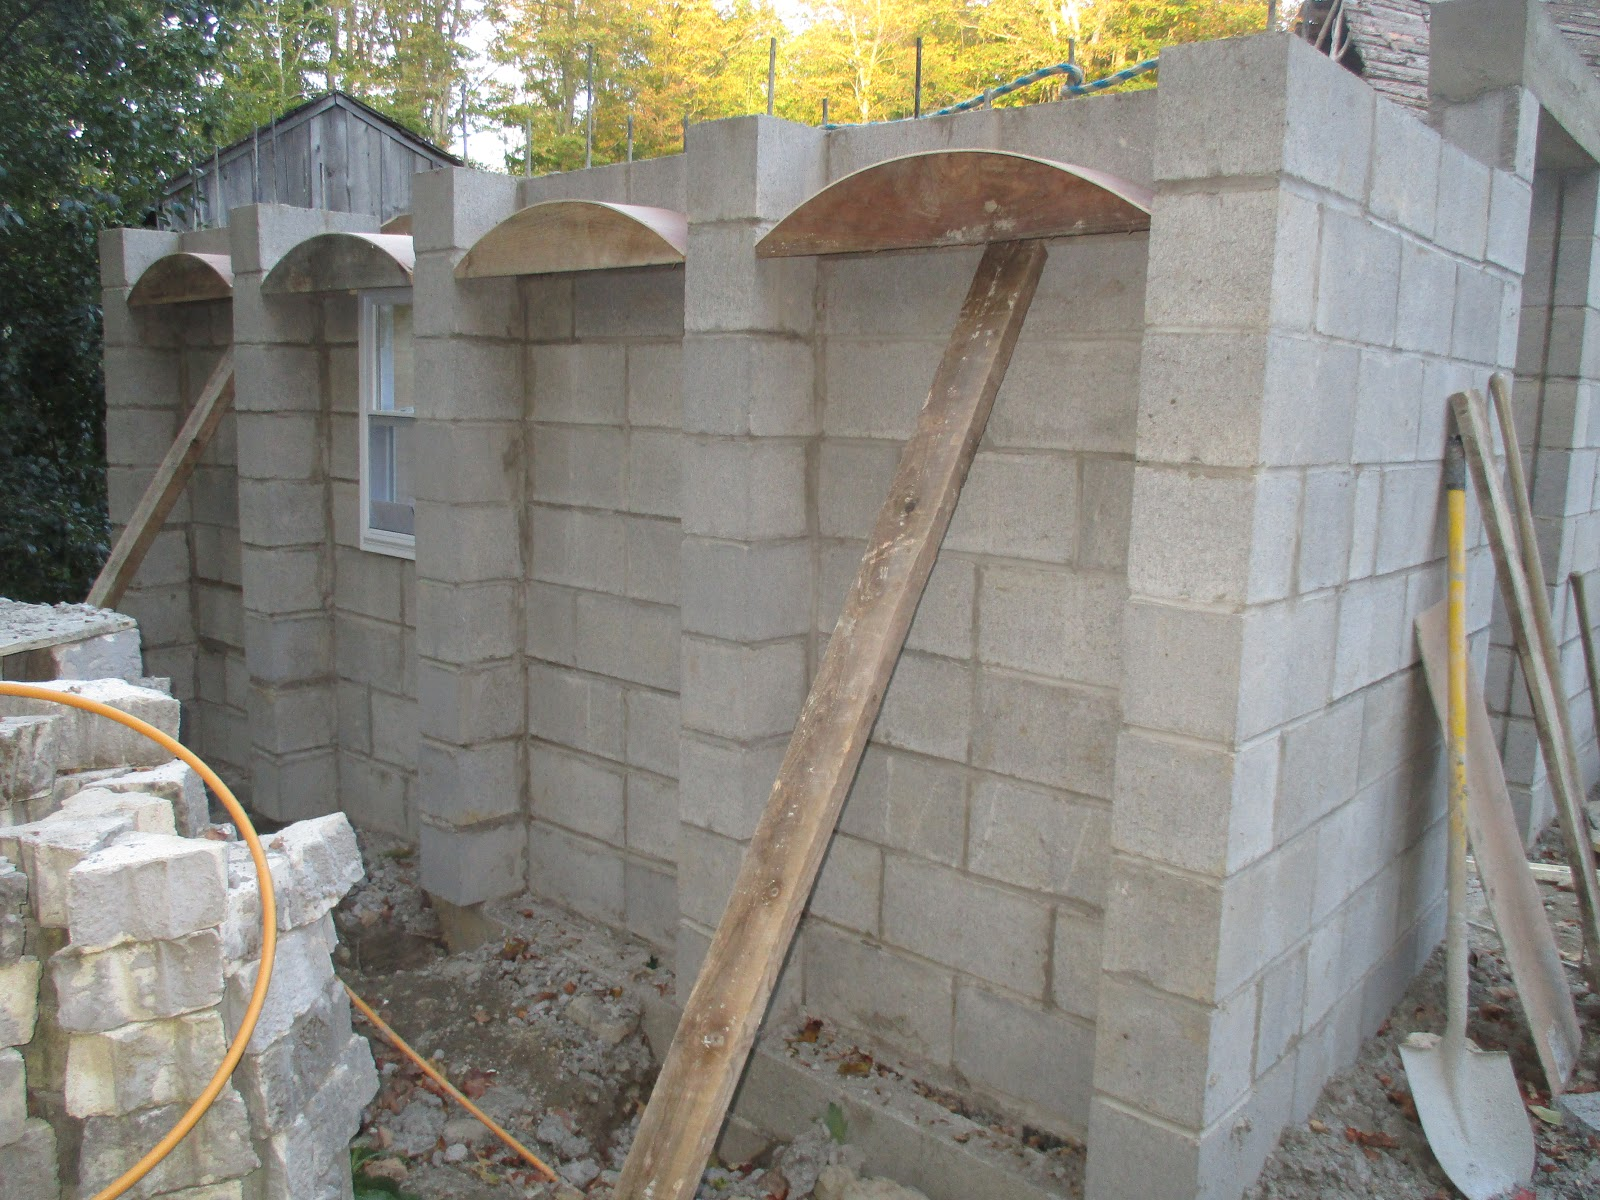 Masonry Design: Making a small concrete block masonry building